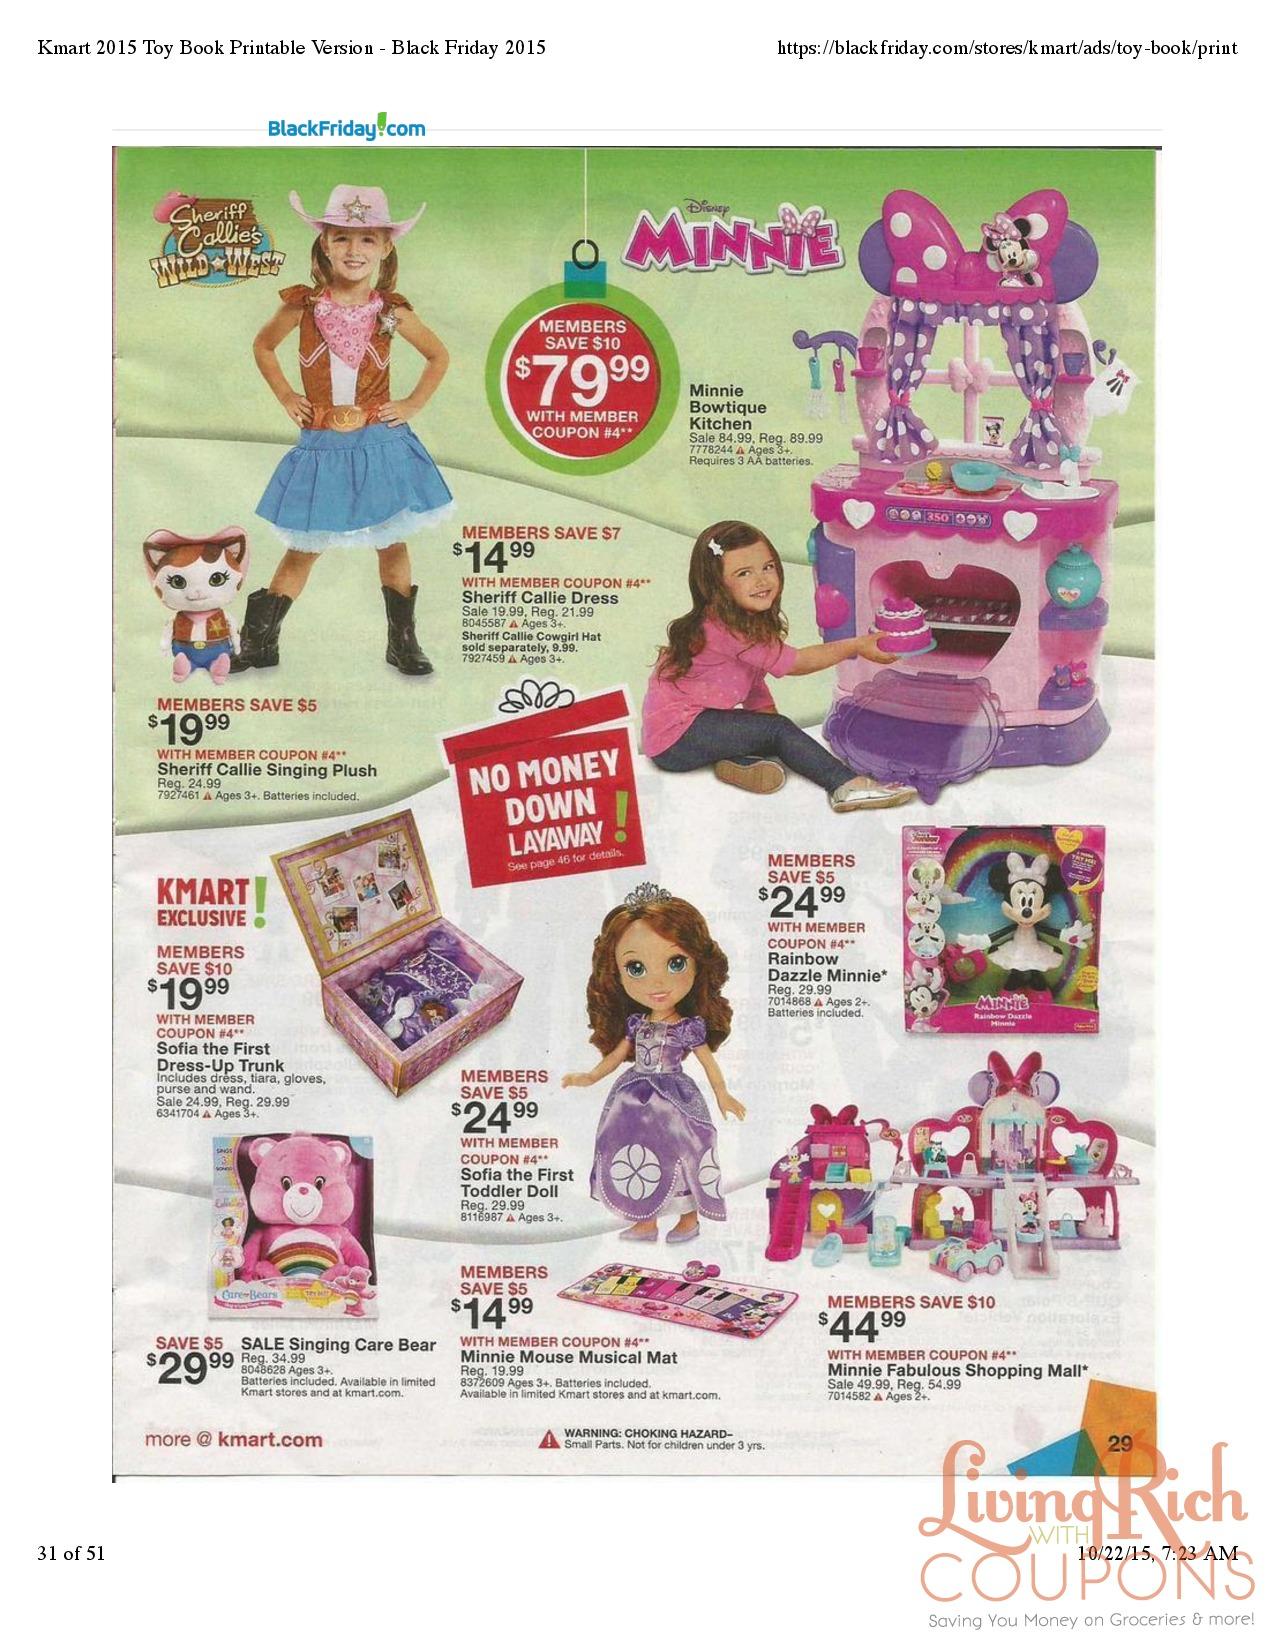 Coupon code kmart toys